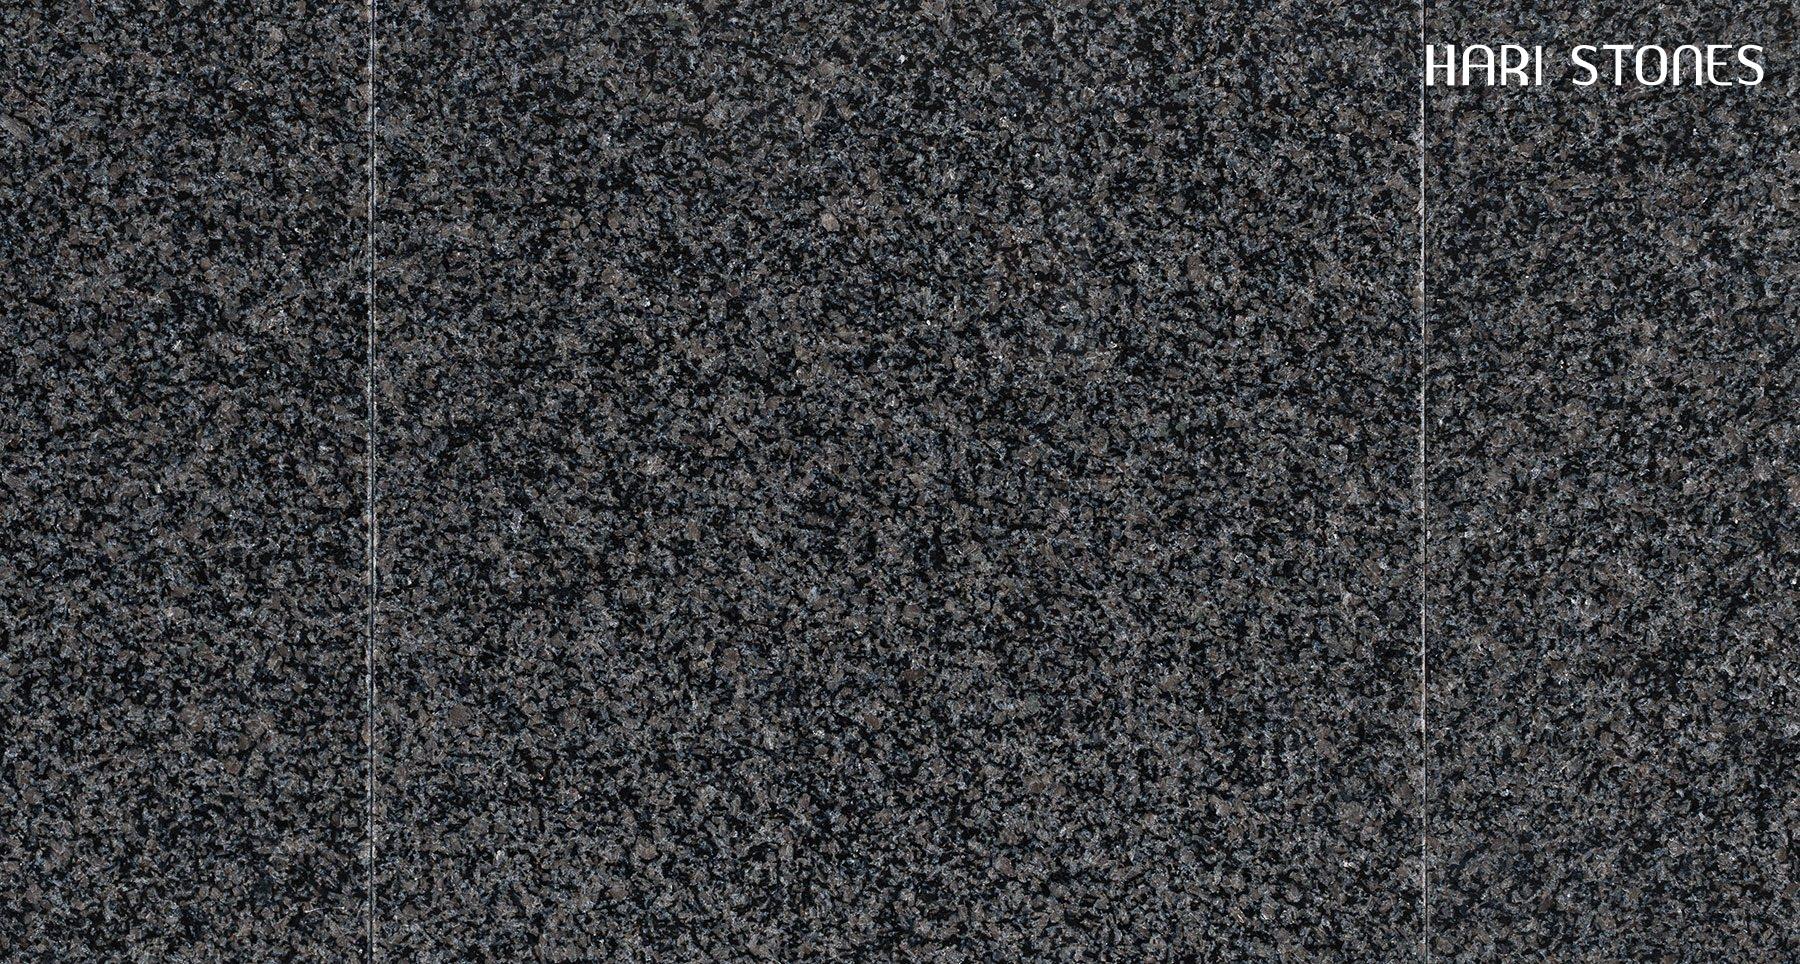 Nero Impala Granite Tiles Distributors